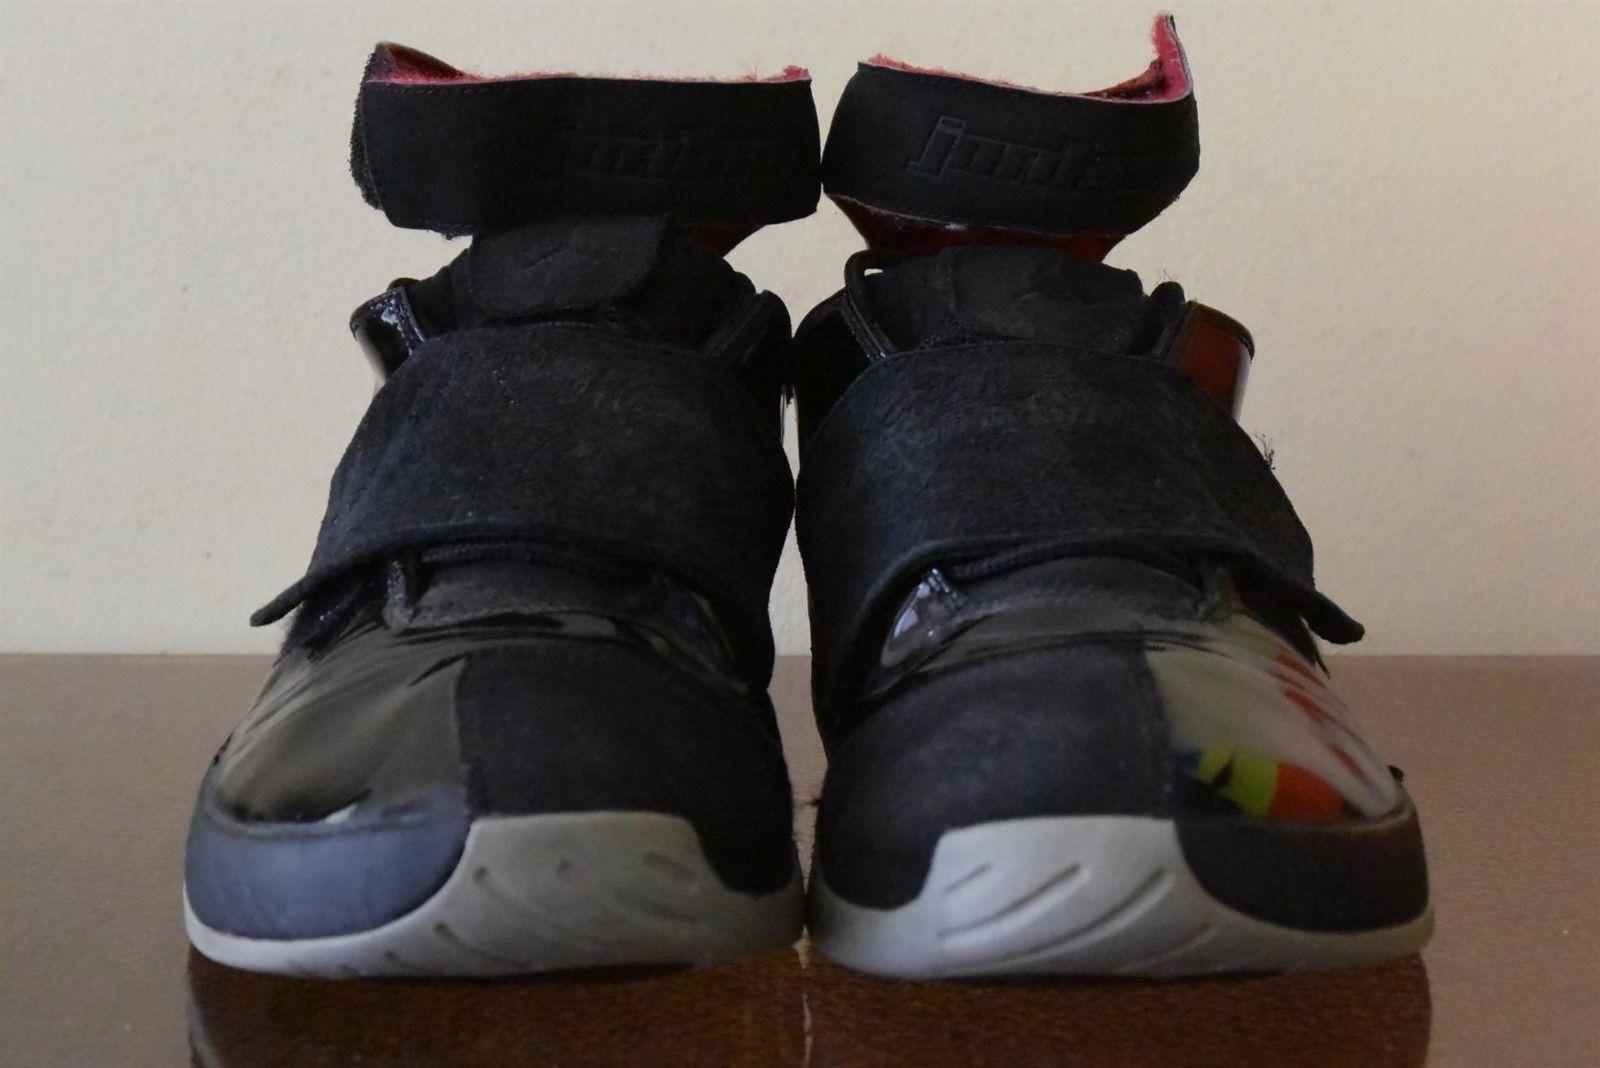 Nike Air Jordan Jordan Jordan 20 XX Stealth Black   Varsity Red 310455-001 Sz 11 819bd4